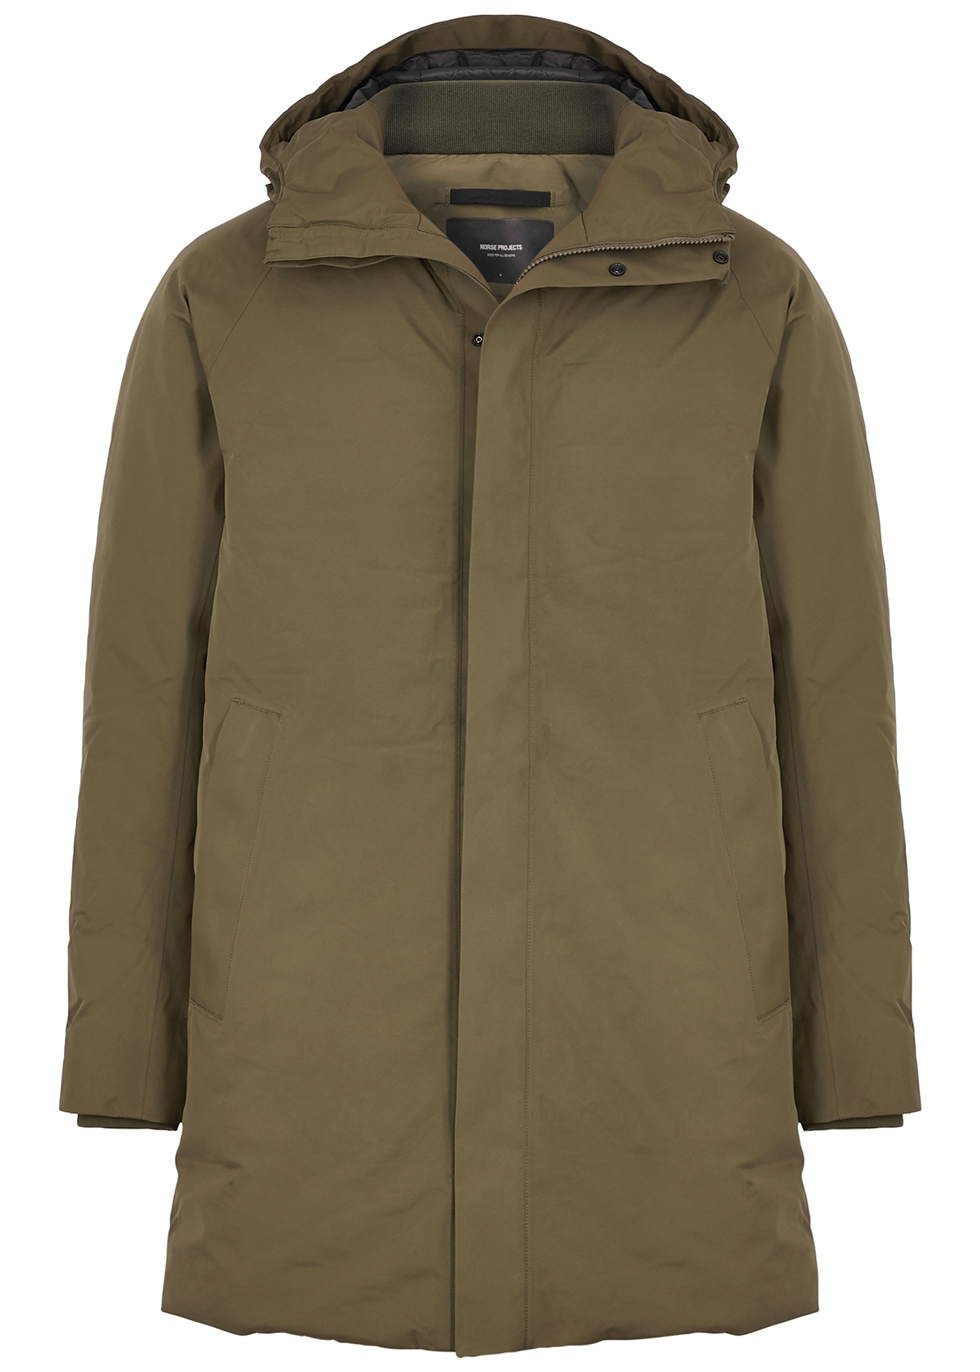 Rokkvi army green Gore-Tex® jacket